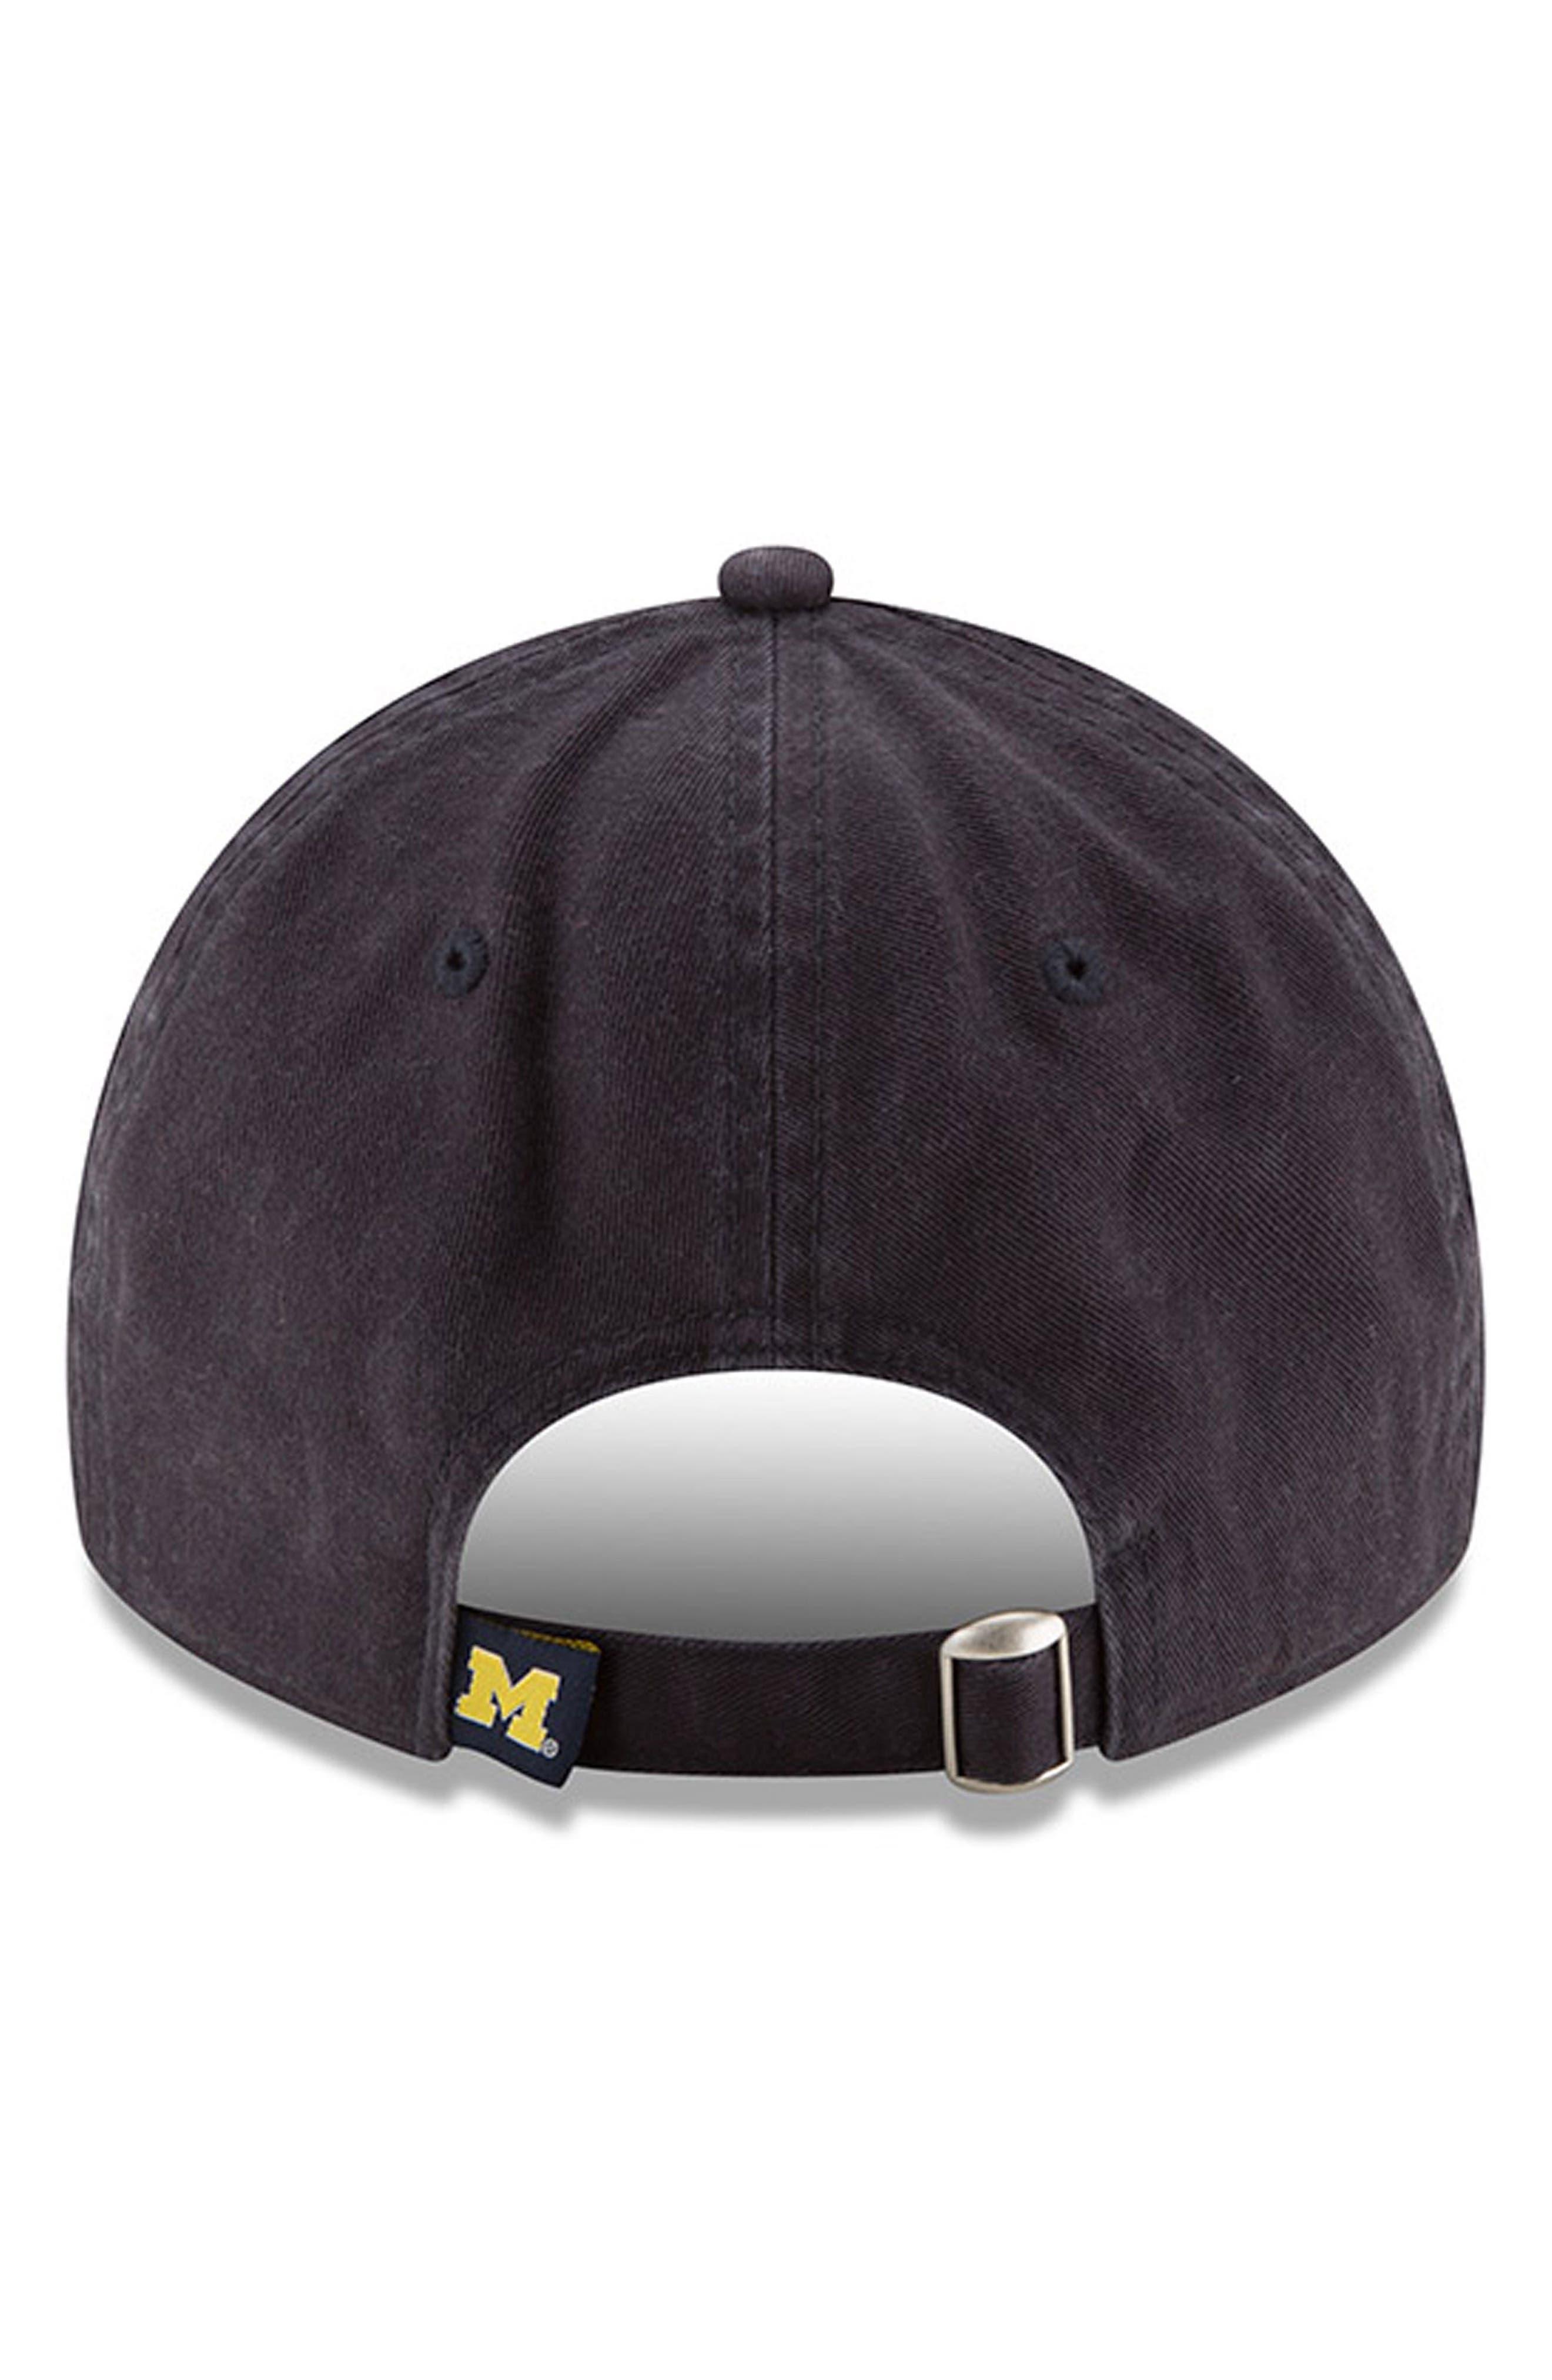 New Era Collegiate Core Classic - Michigan Wolverines Baseball Cap,                             Alternate thumbnail 3, color,                             410